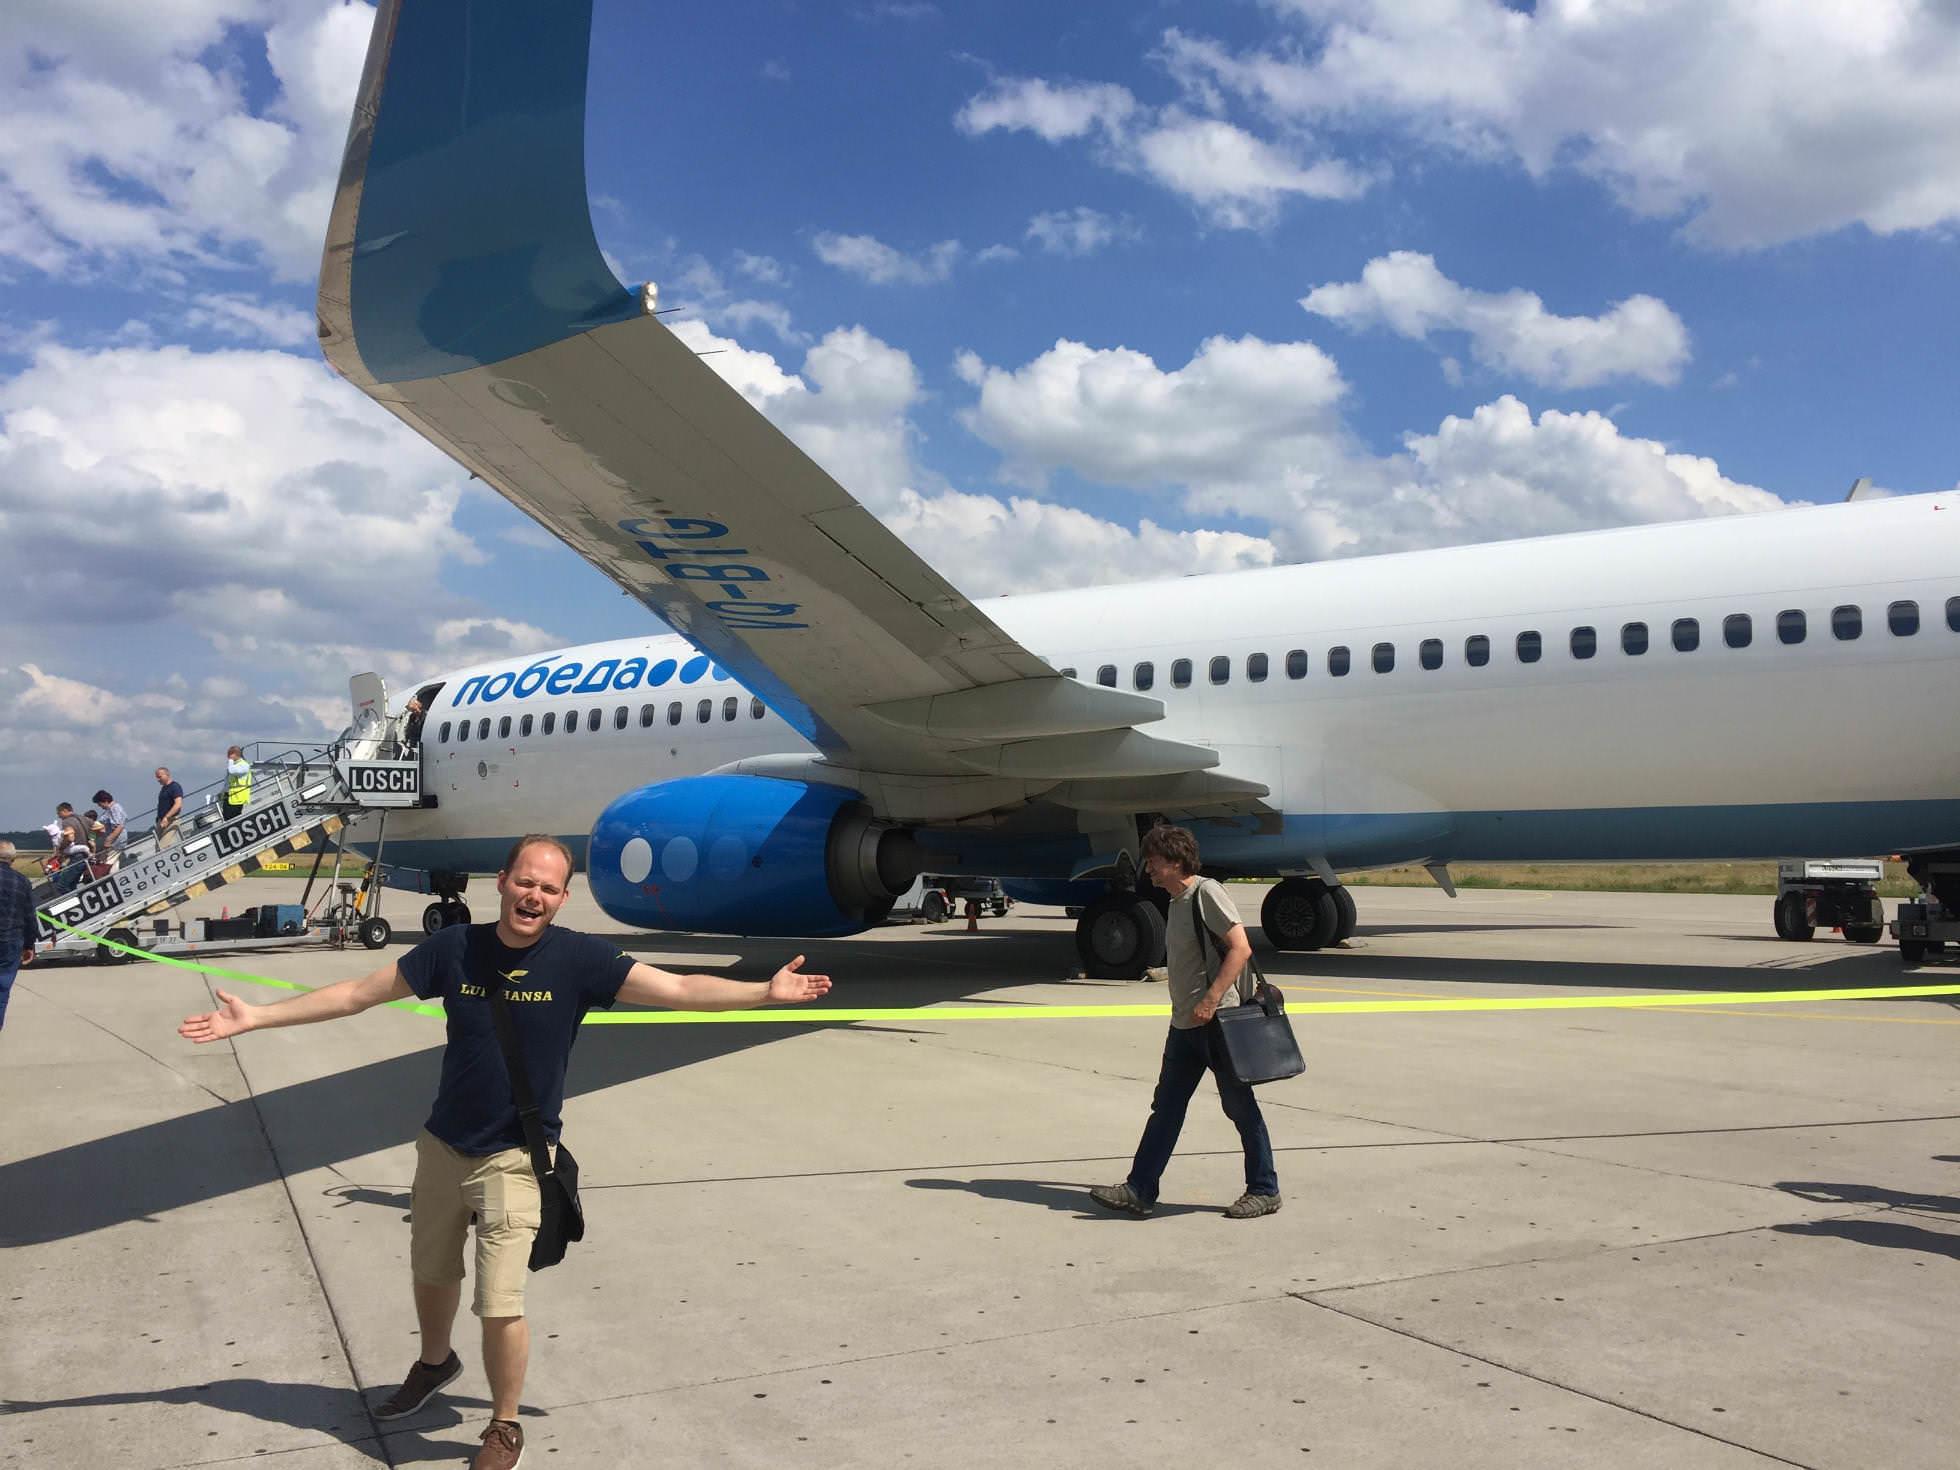 Pobeda Flugzeug Vnukovo Airport